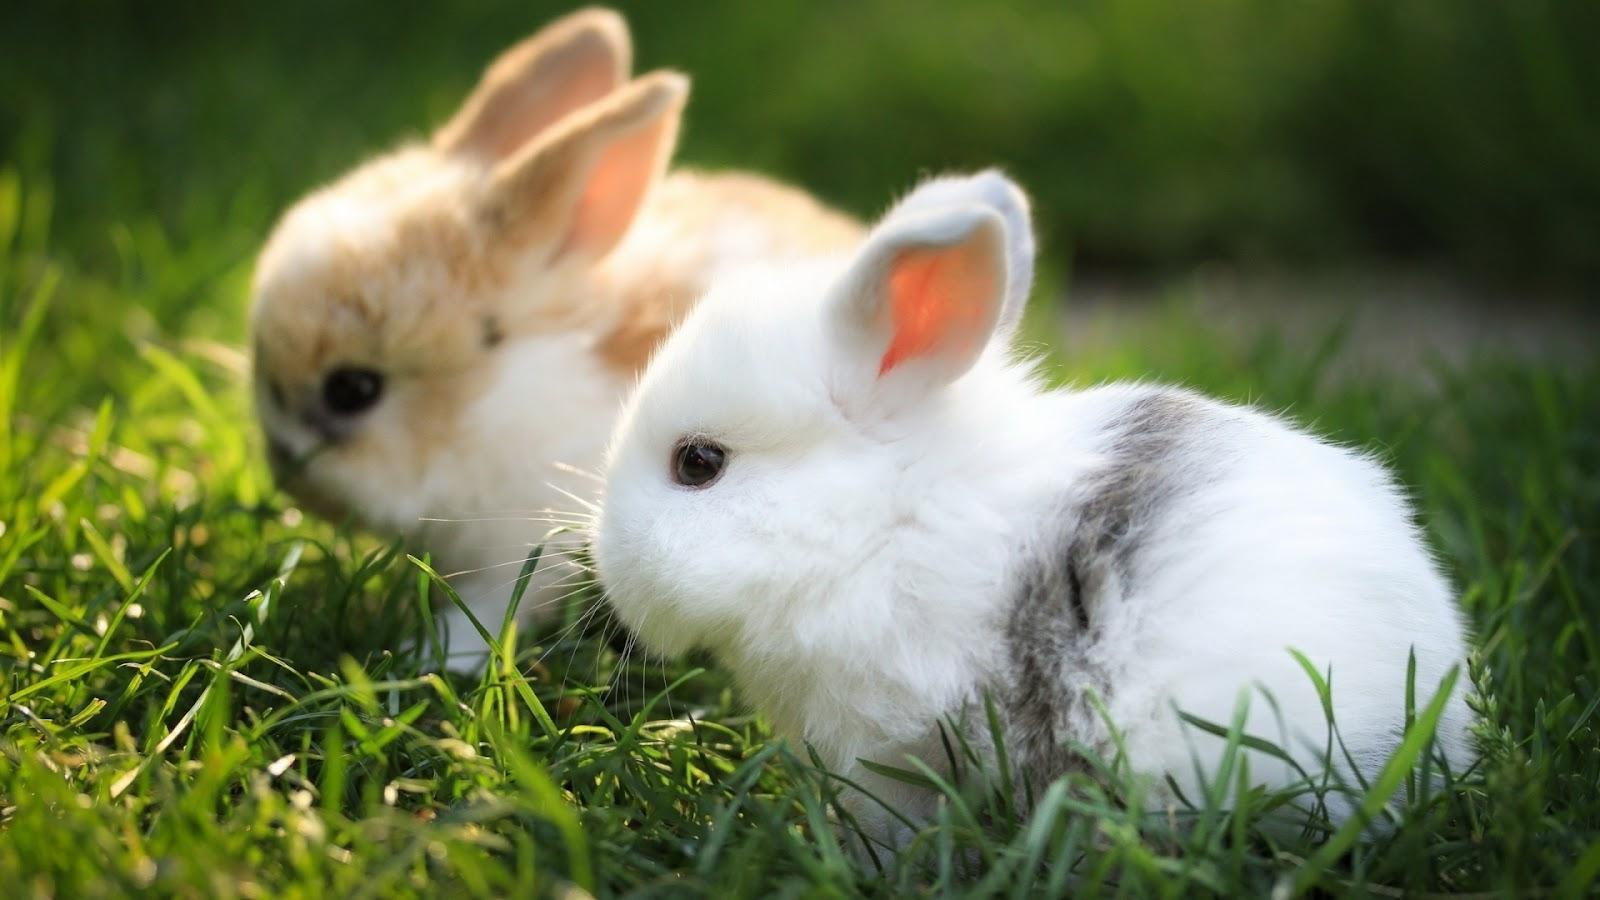 swf动画素材兔子